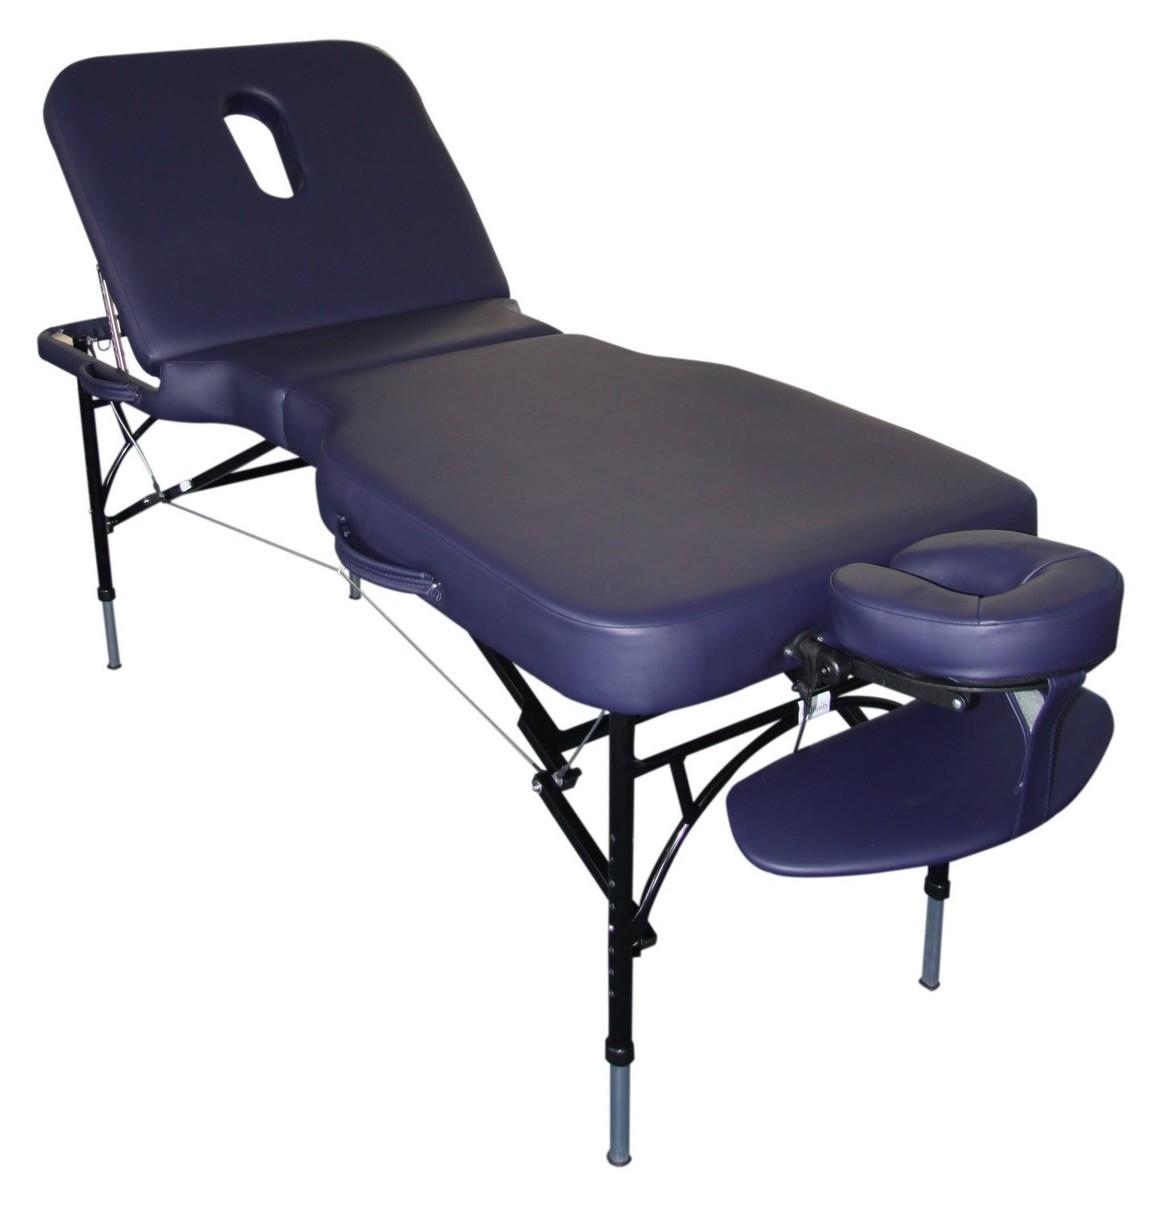 Affinity athlete portable massage tables uk for Massage table